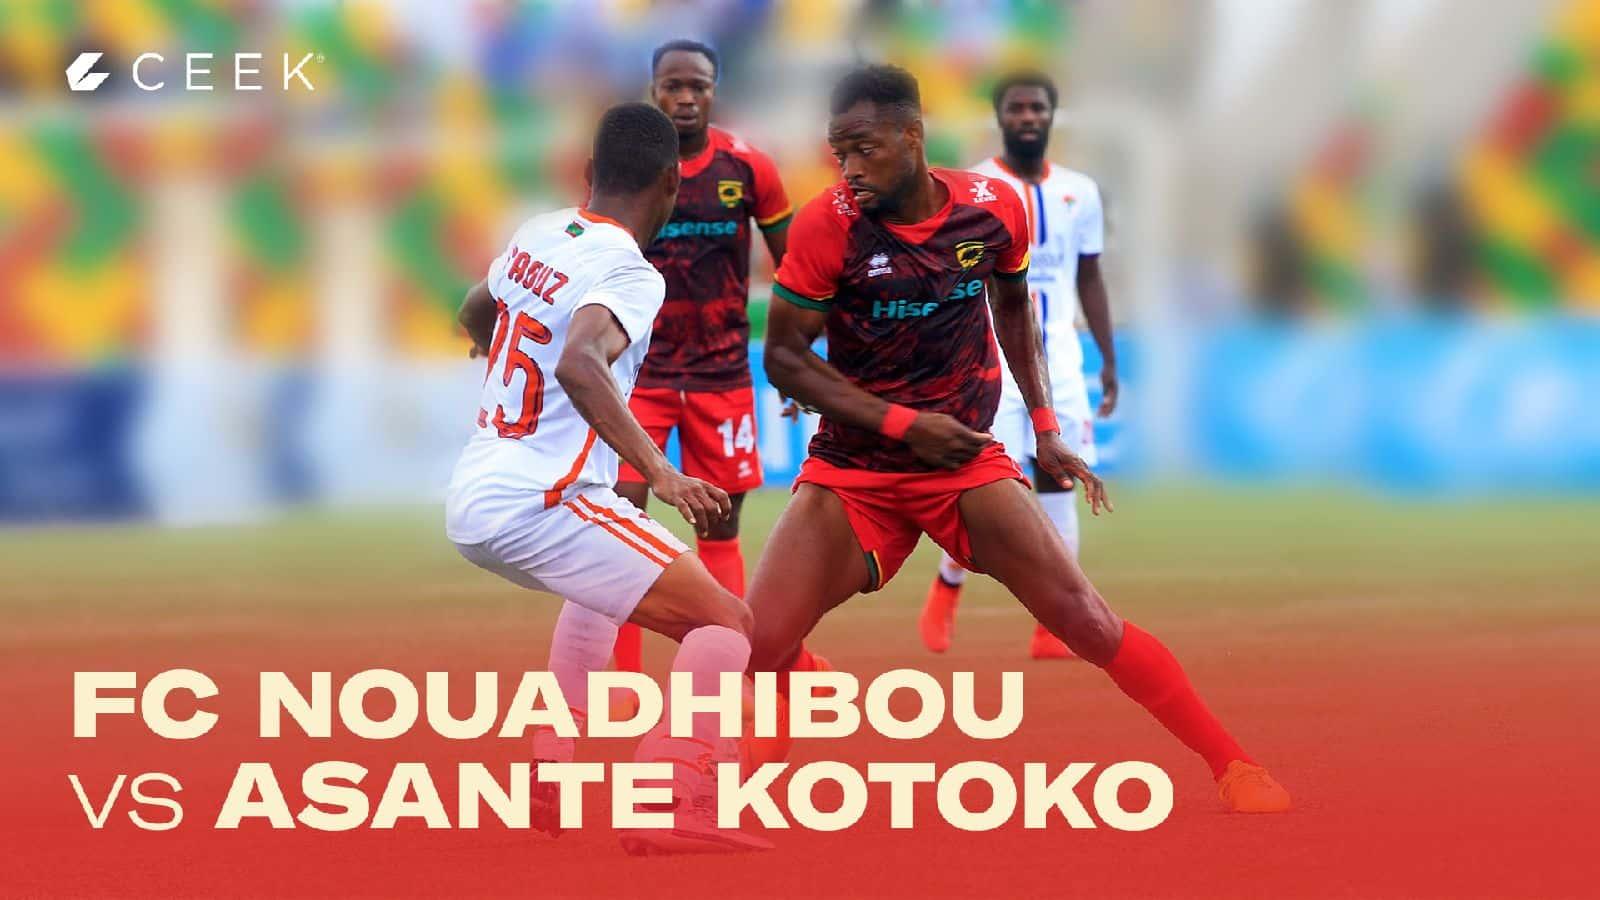 FC Nouadhibou v Asante Kotoko 29 November 2020